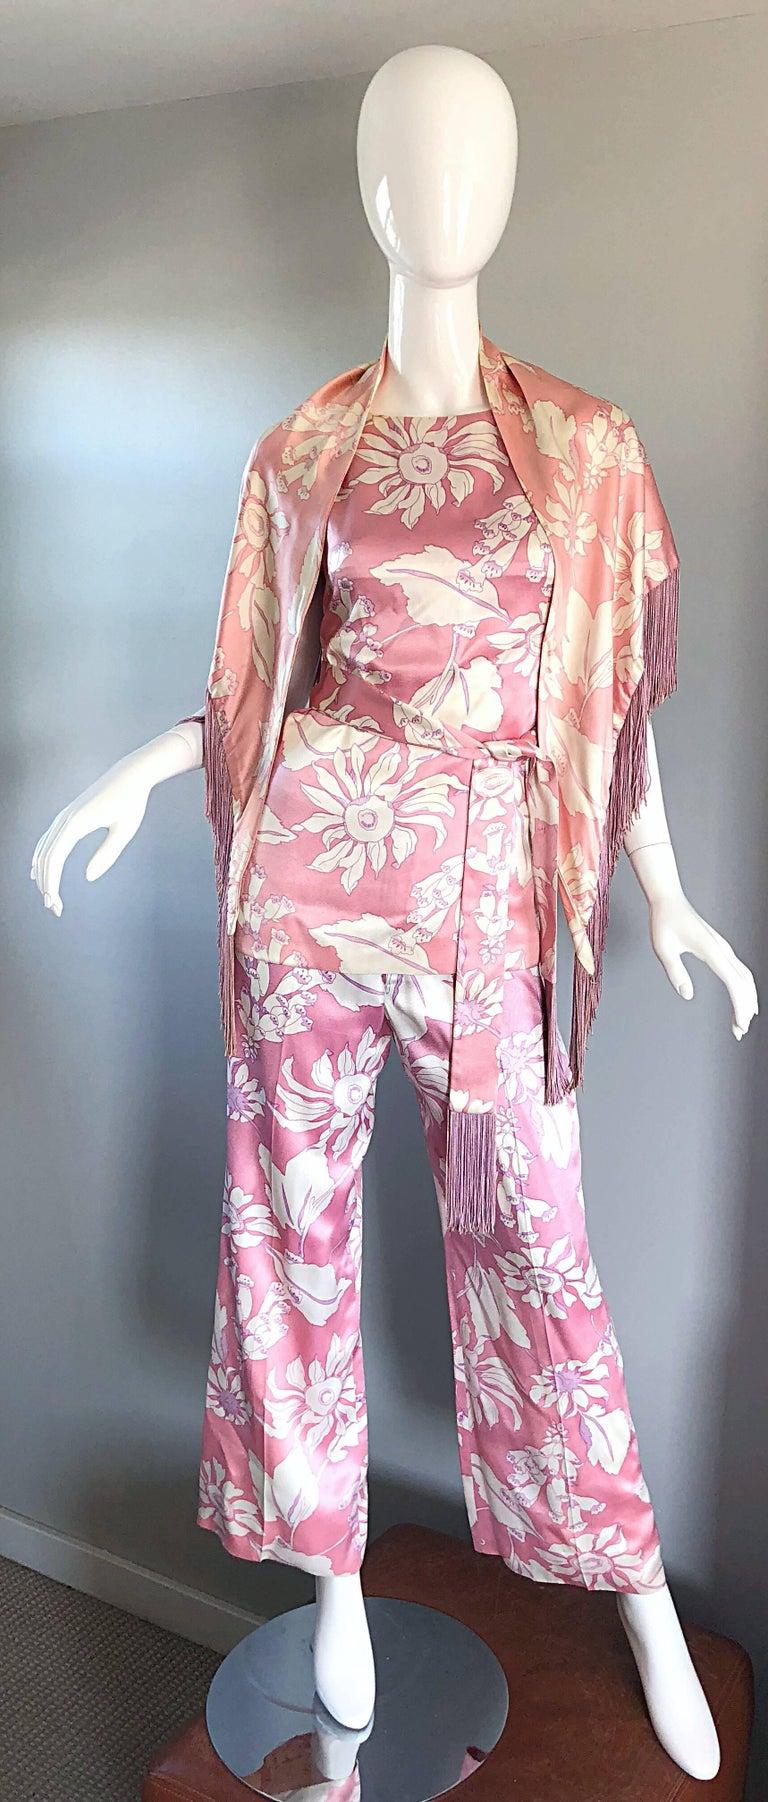 Geoffrey Beene Vintage 1970s Pink + White Four Piece Silk Pants Top Belt & Shawl For Sale 4